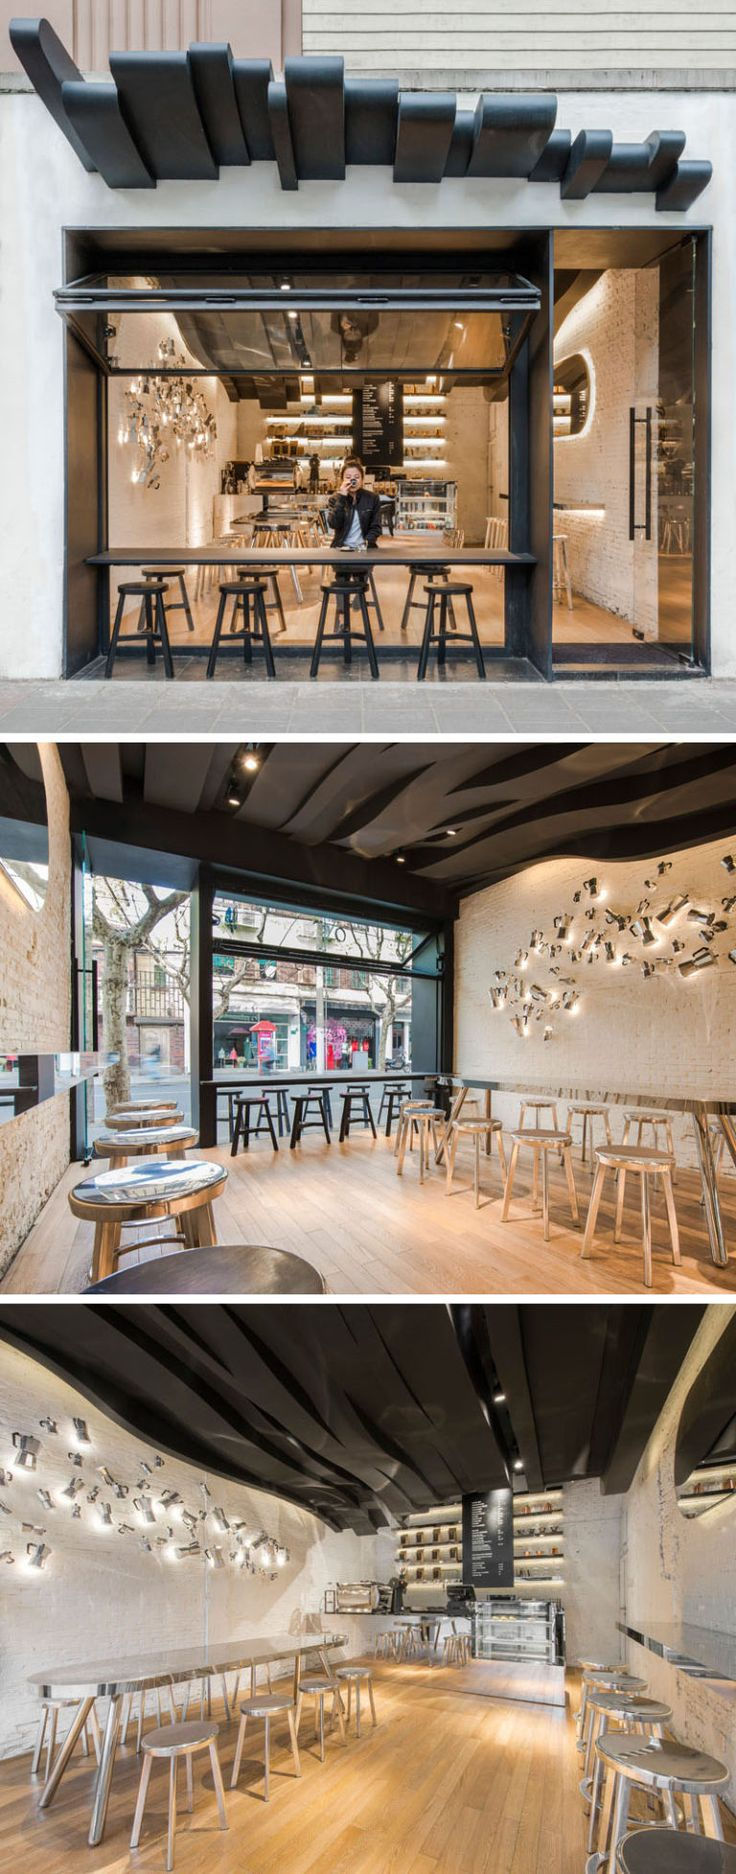 68 best !!!!!ΩΩΩ images on Pinterest | Industrial style, Arquitetura ...